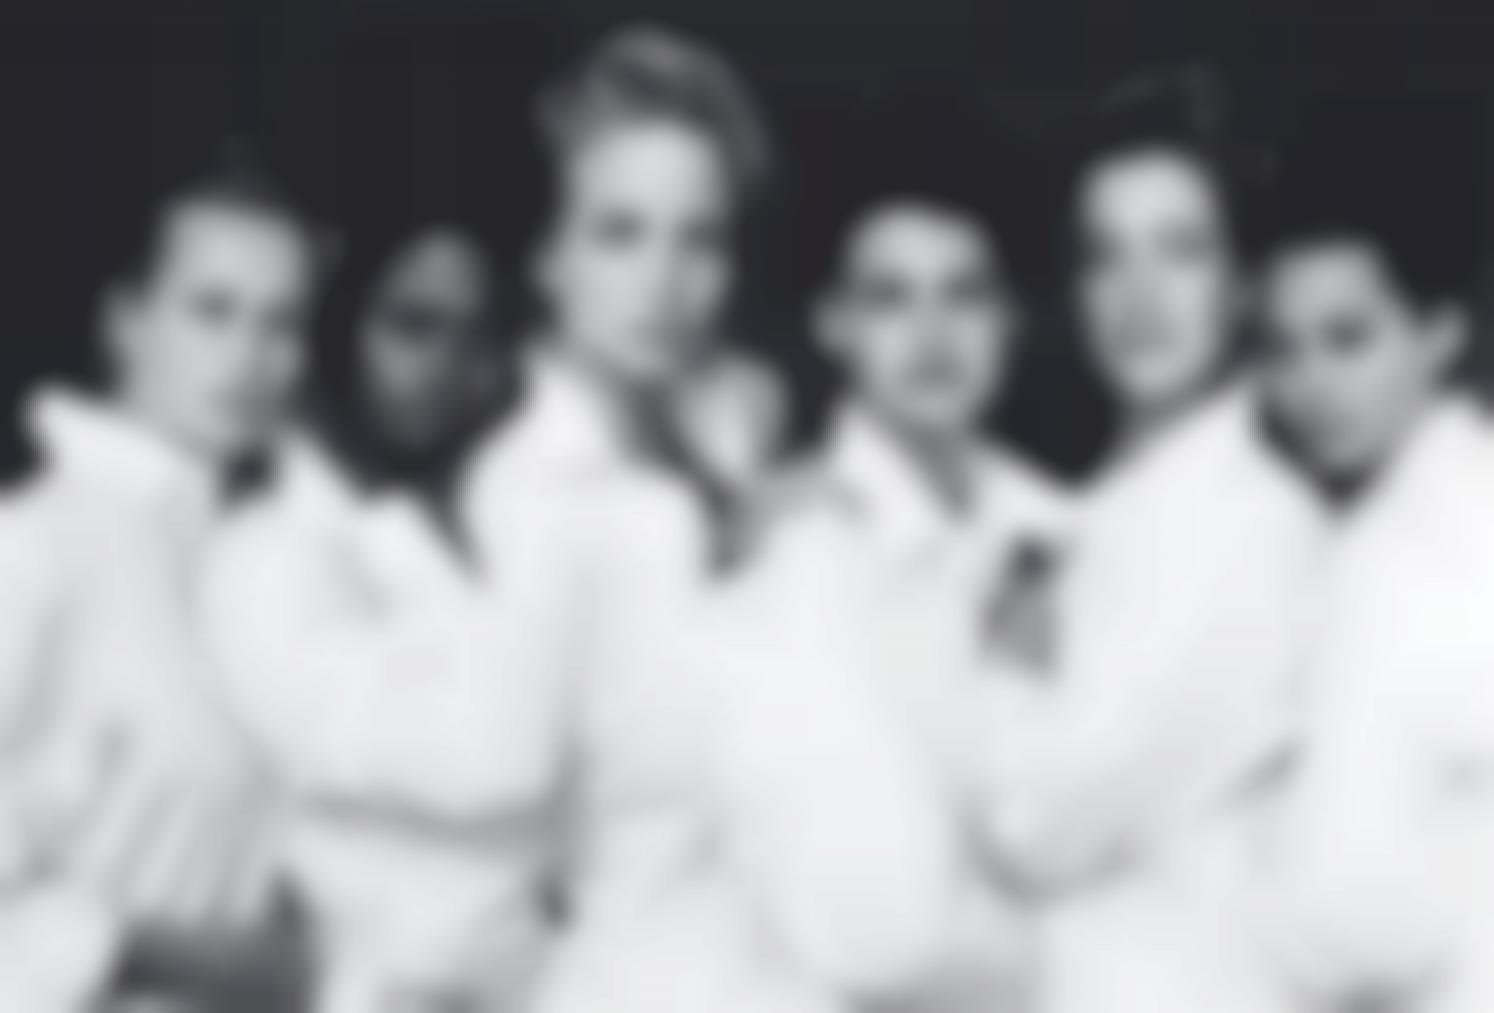 Peter Lindbergh-Estelle Lefebure, Karen Alexander, Rachel Williams, Linda Evangelista, Tatjana Patitz, Christy Turlington, Santa Monica, California-1988